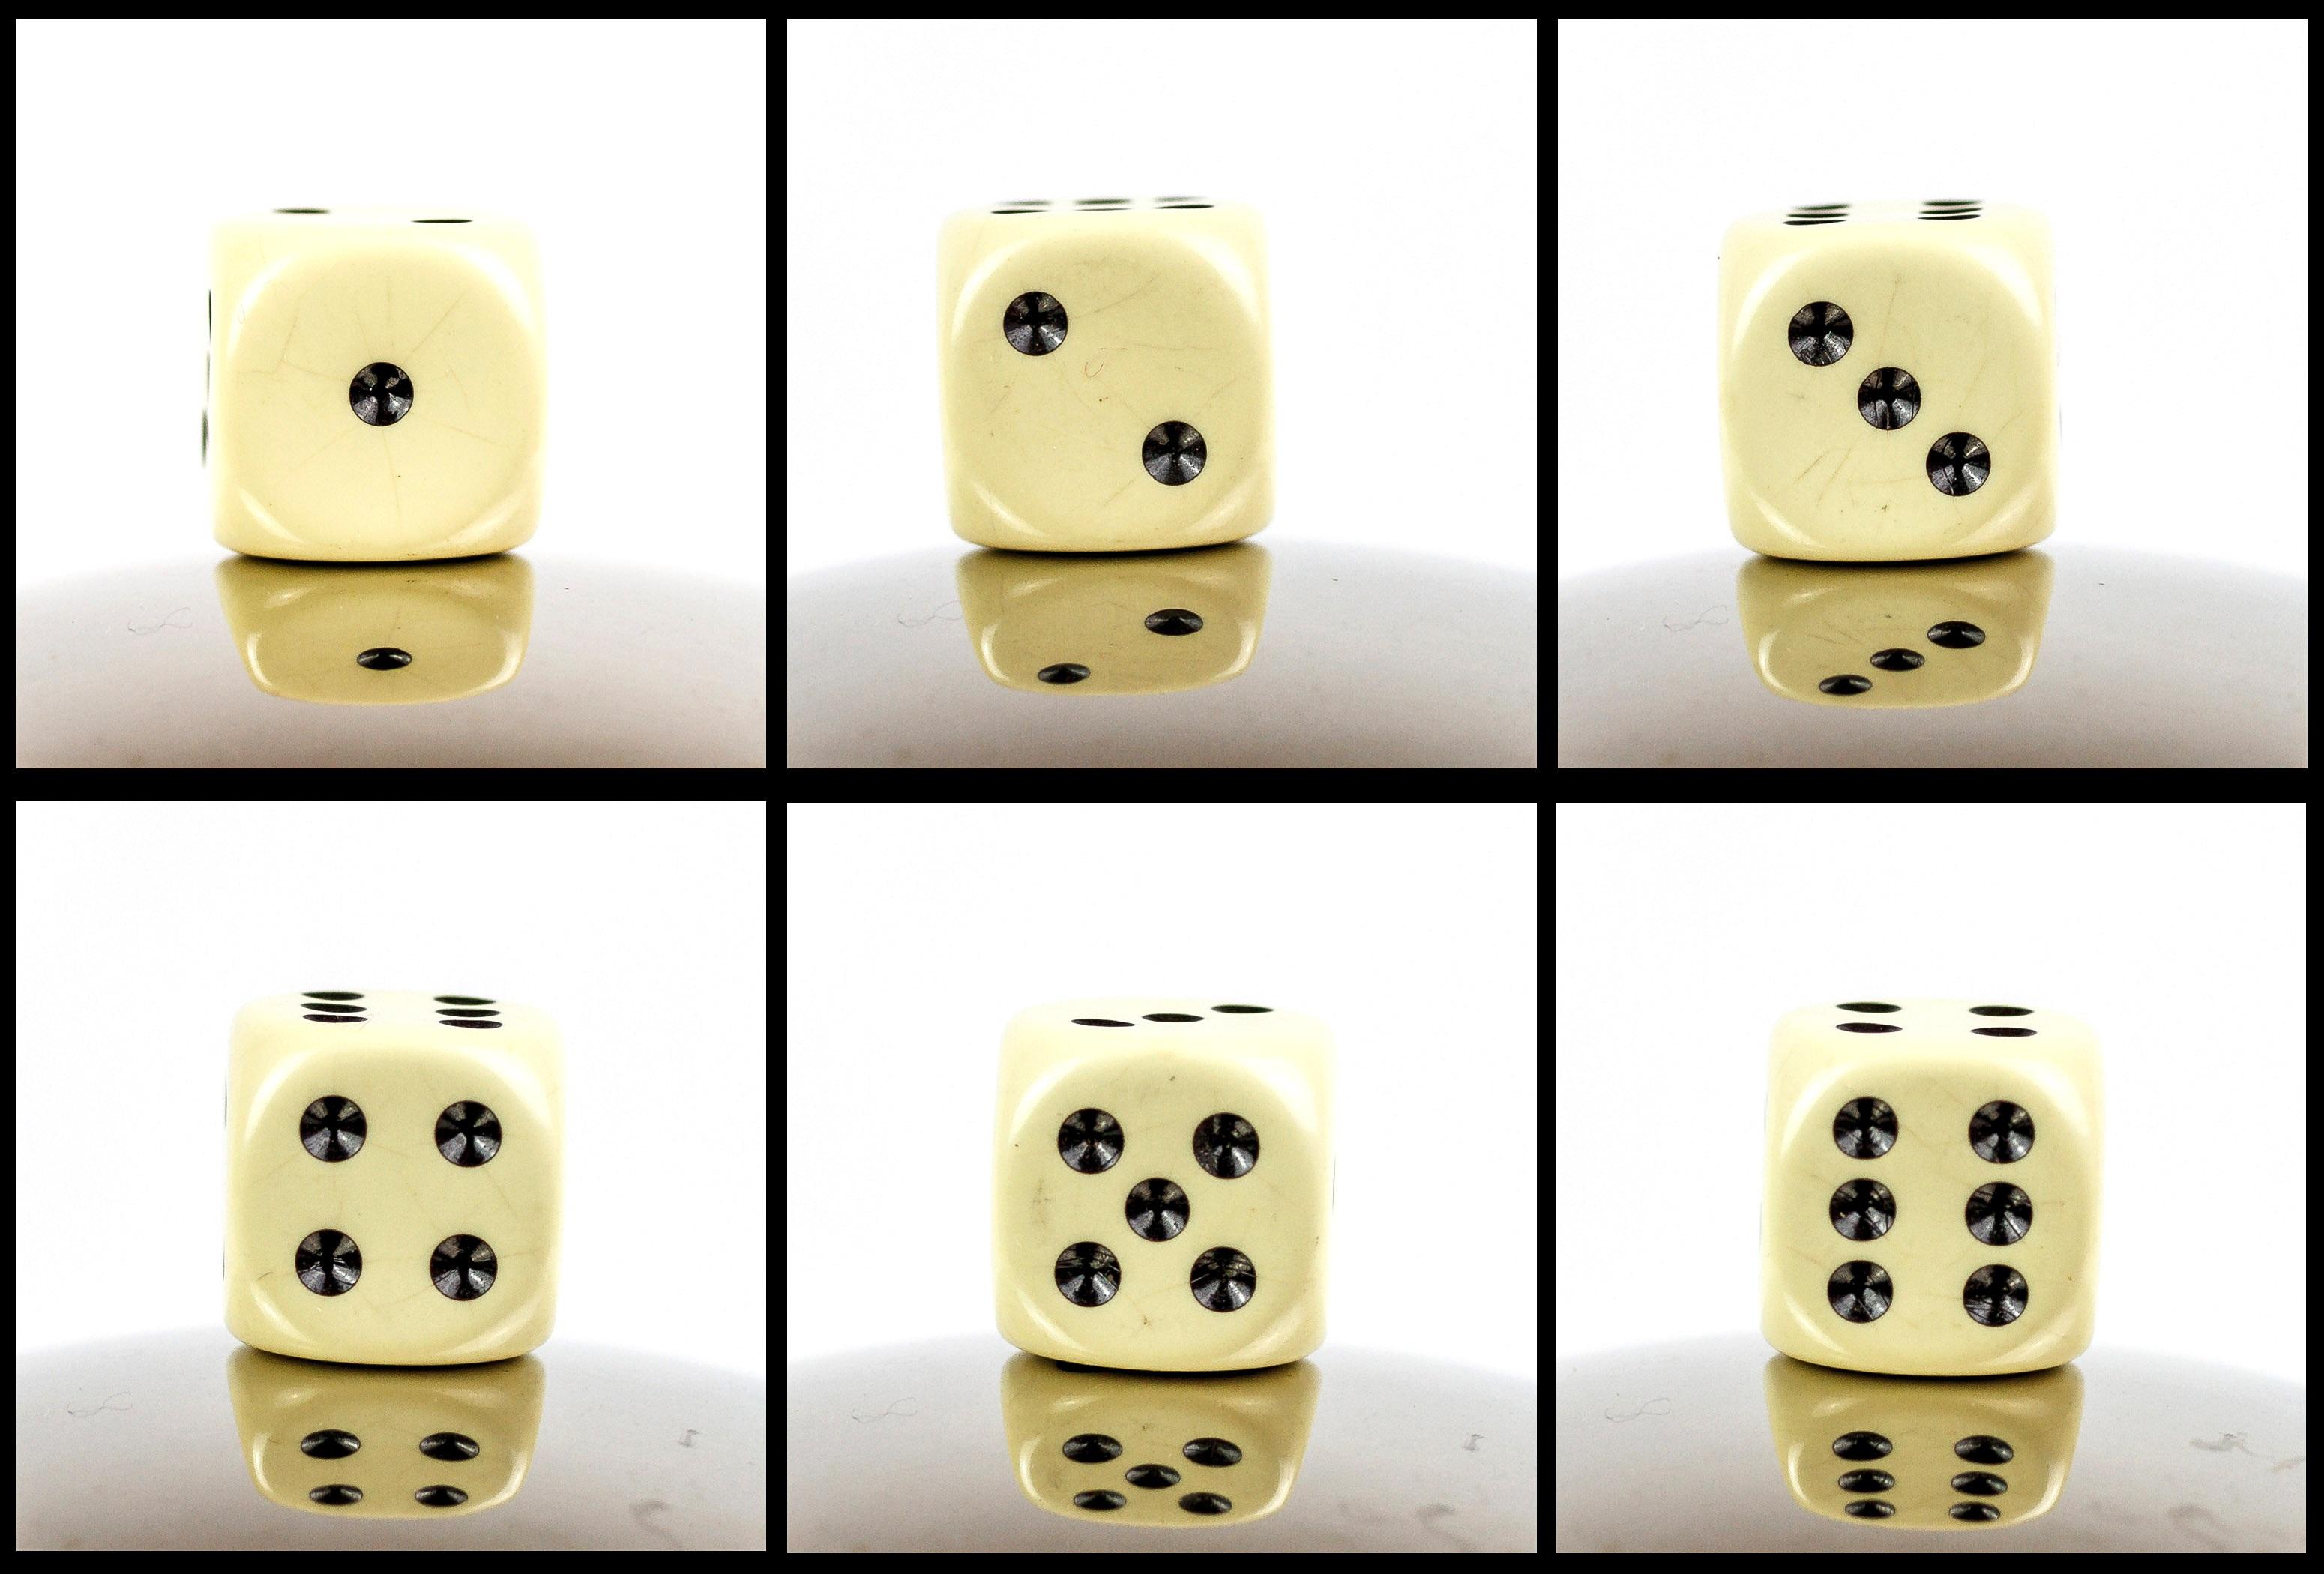 Gambling number boards real life gambling addiction stories